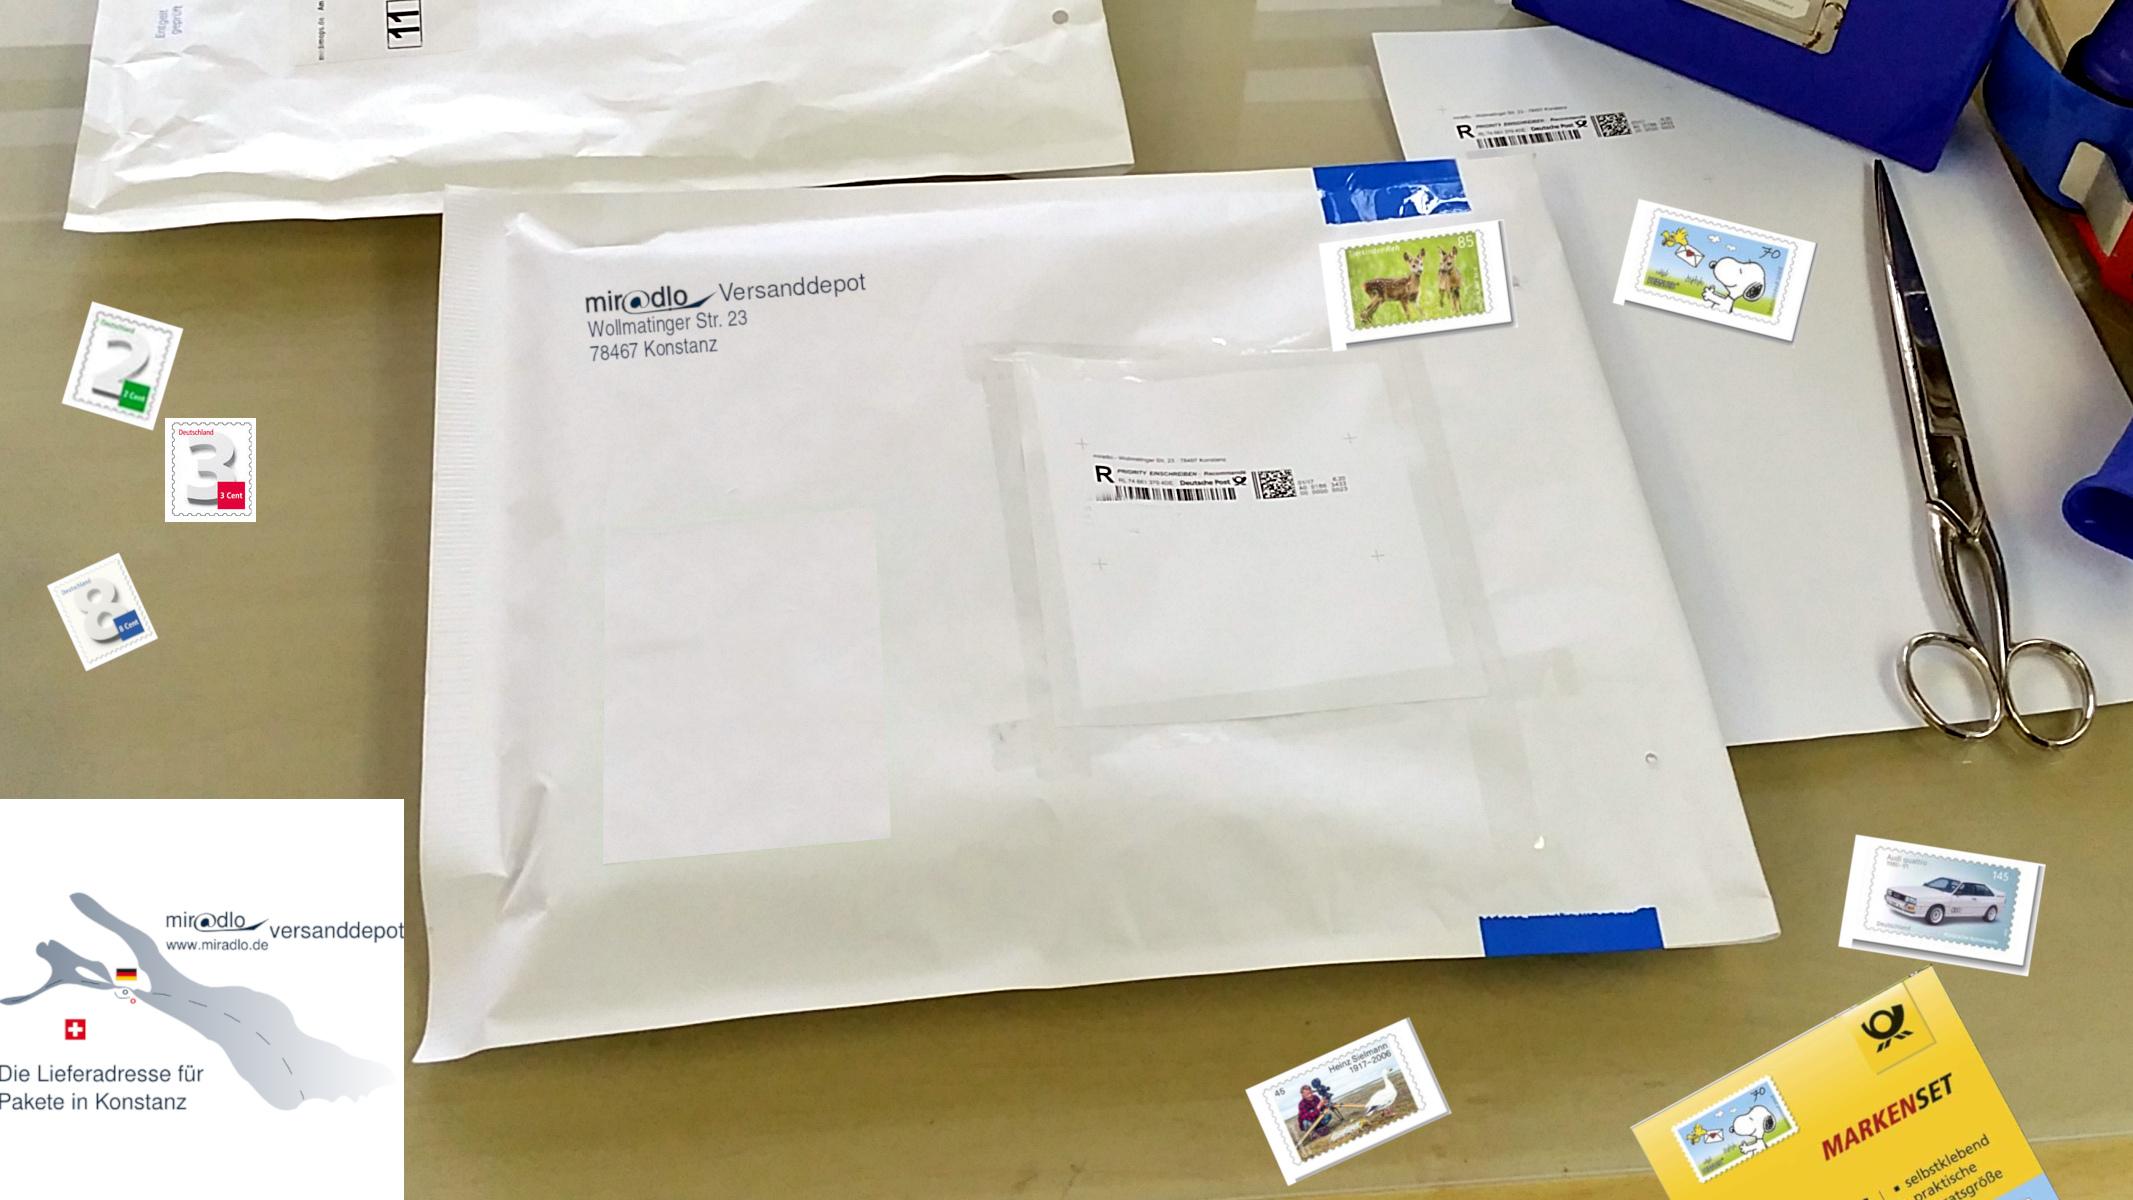 Brief, Standardbrief, Porto, Briefmarken, Portoerhöhung ---- miradlo-Versanddepot, Lieferadresse Konstanz